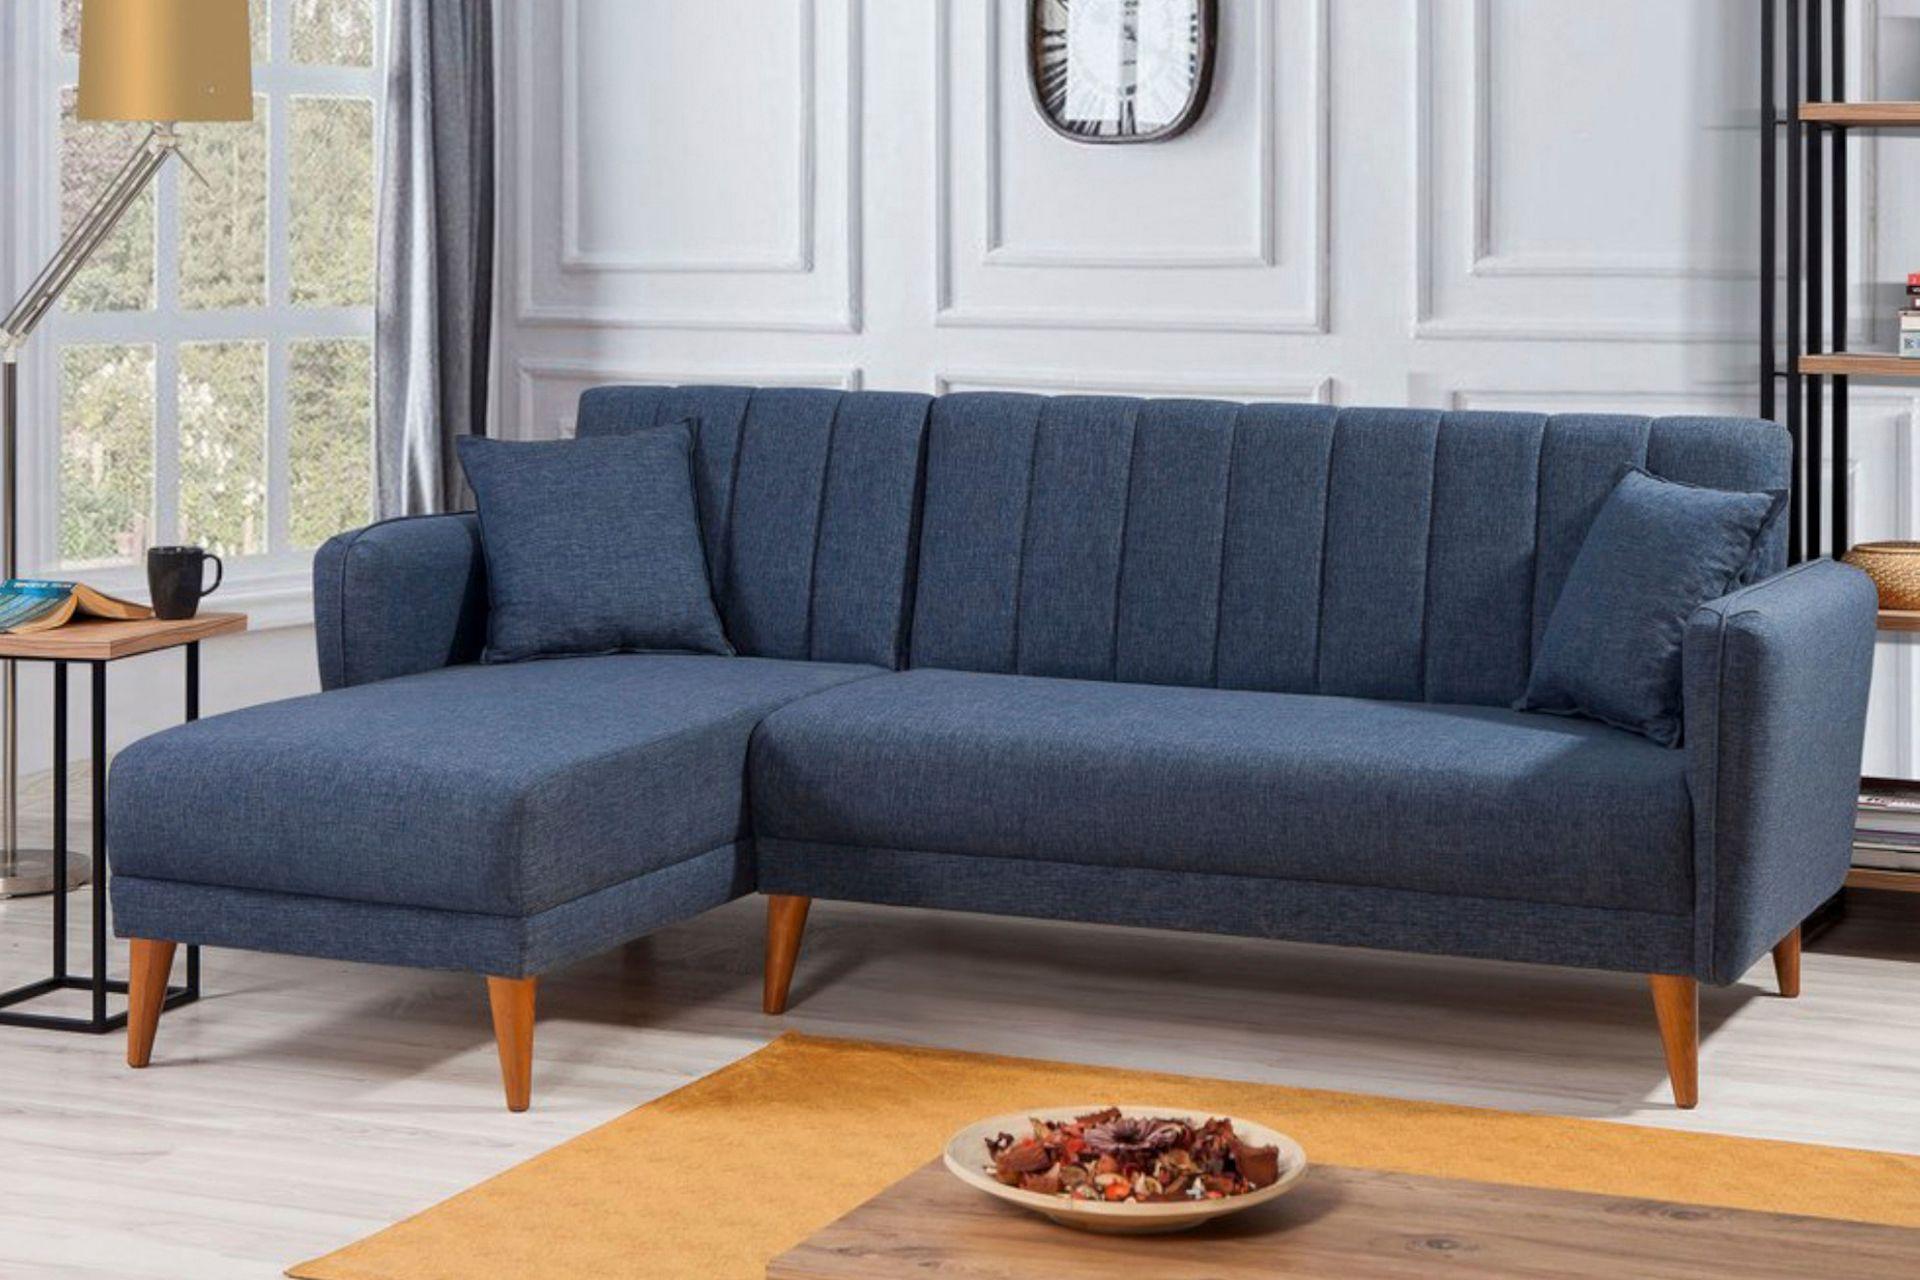 Aqua Corner Chaise Sofa Bed, Left, Navy Blue